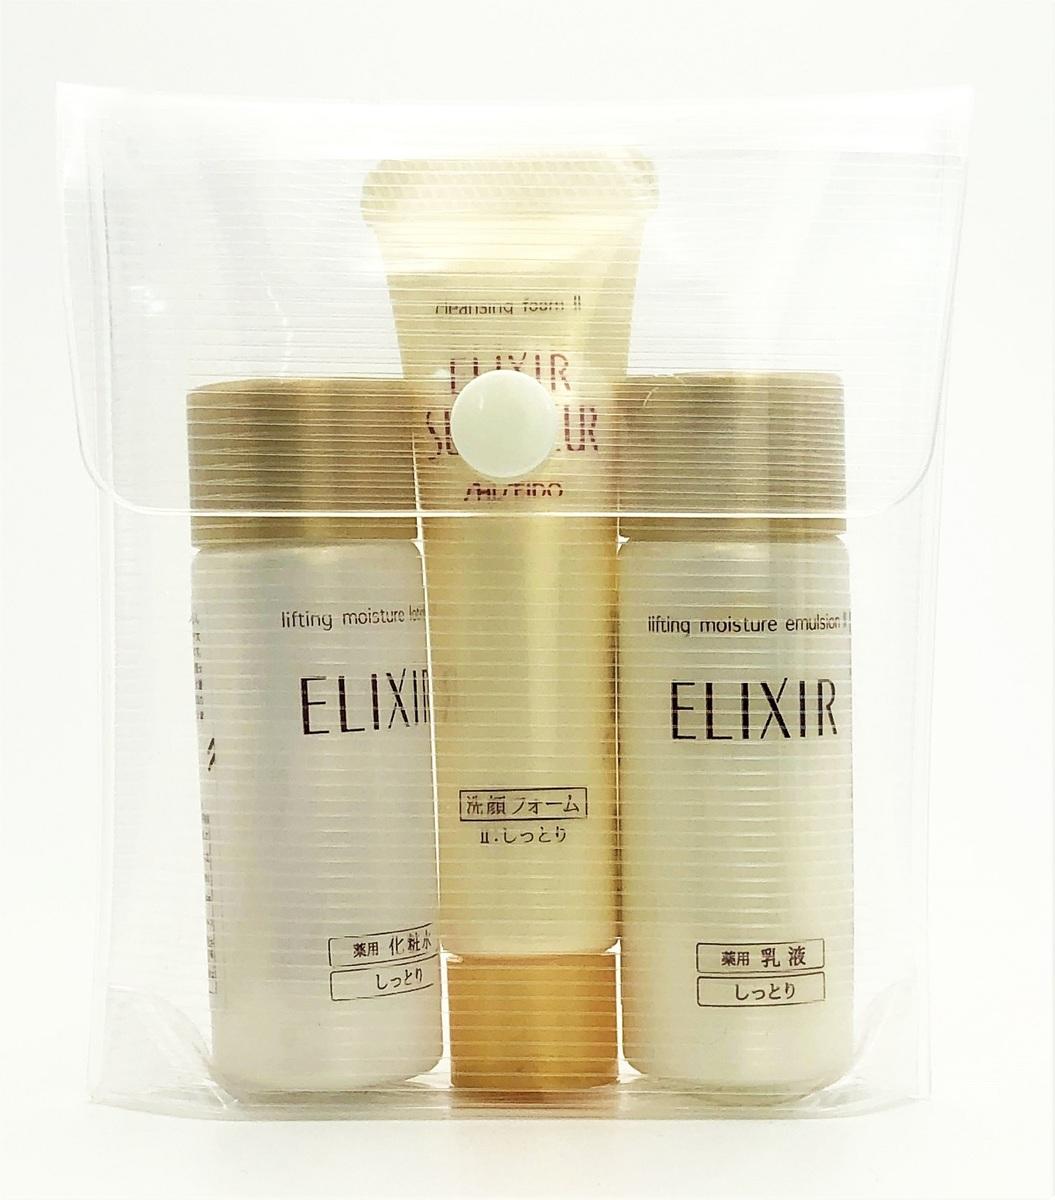 SHISEIDO ELIXIR mini set -[Parallel Import Product]